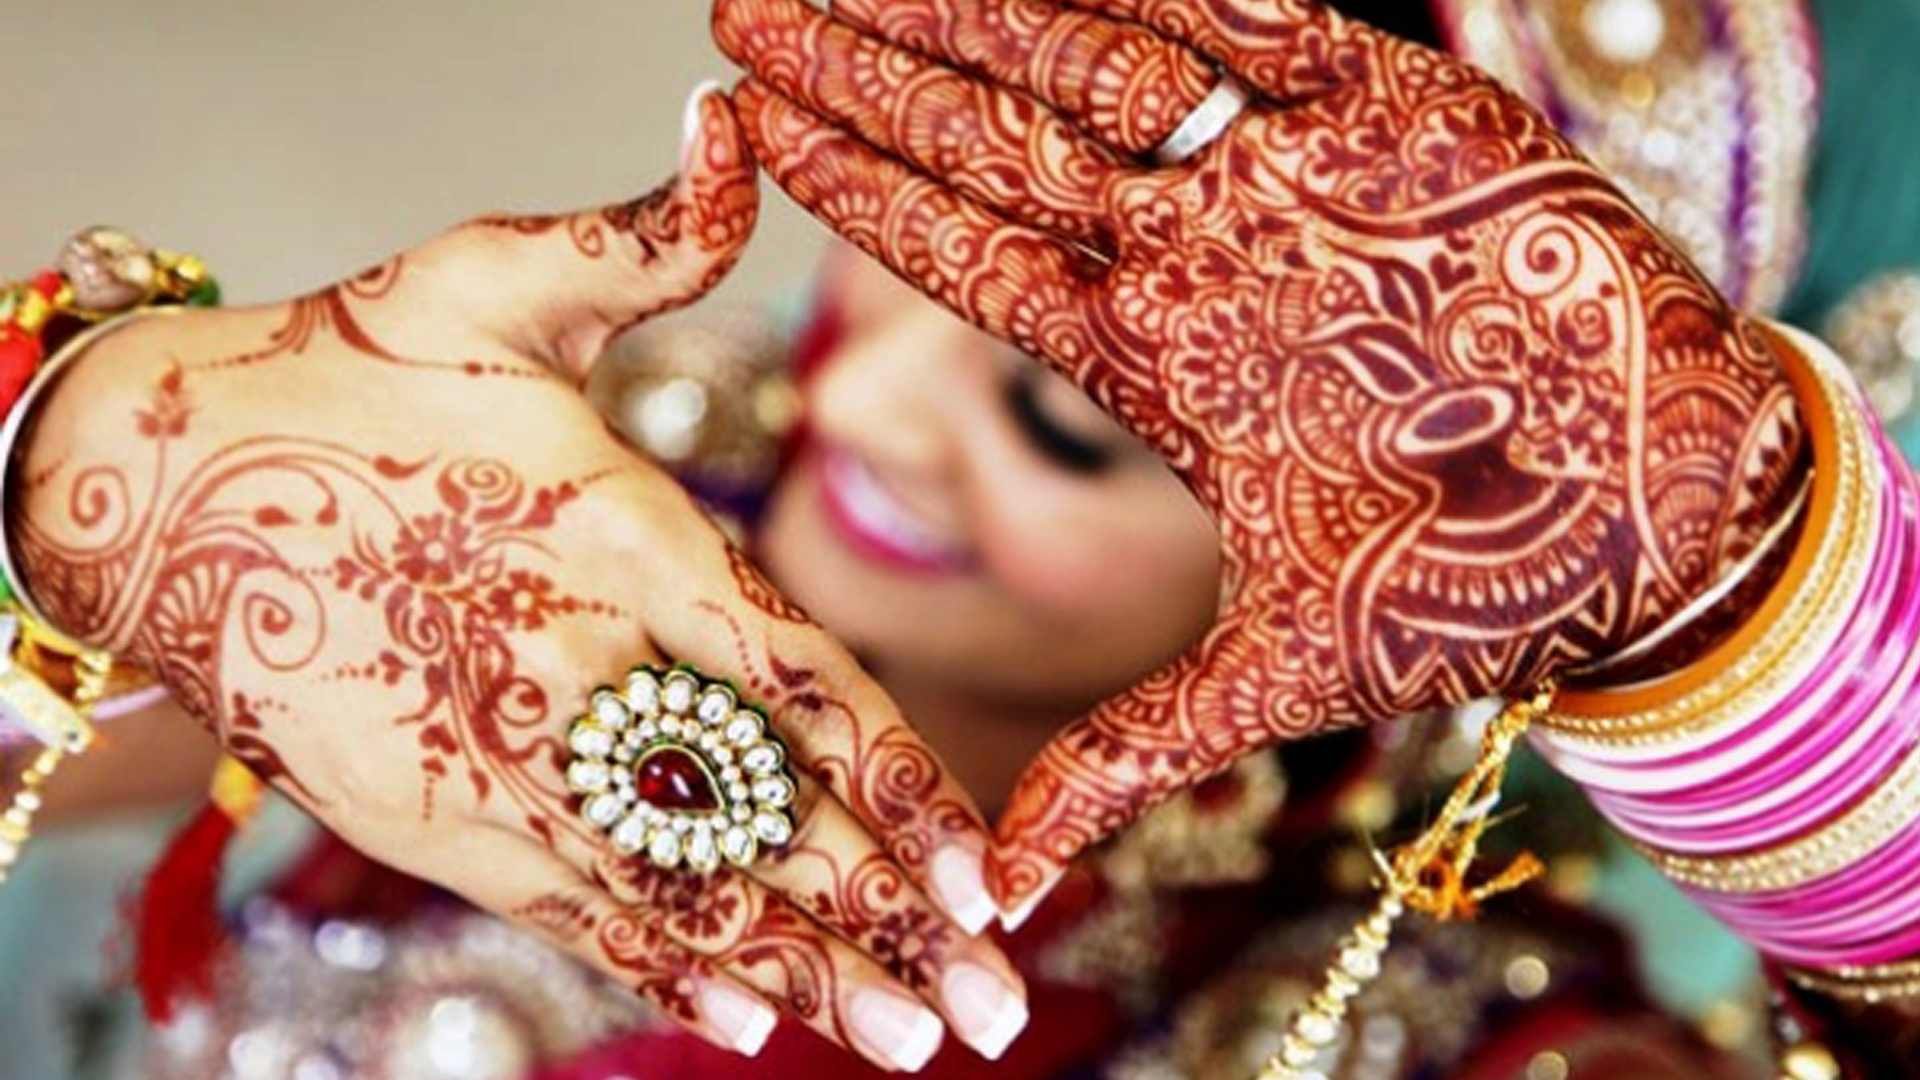 Bridesmaid, Girls, Girl, Girls best friends, Marriage, Wedding, Friends wedding, Offbeat news, Lifestyle news